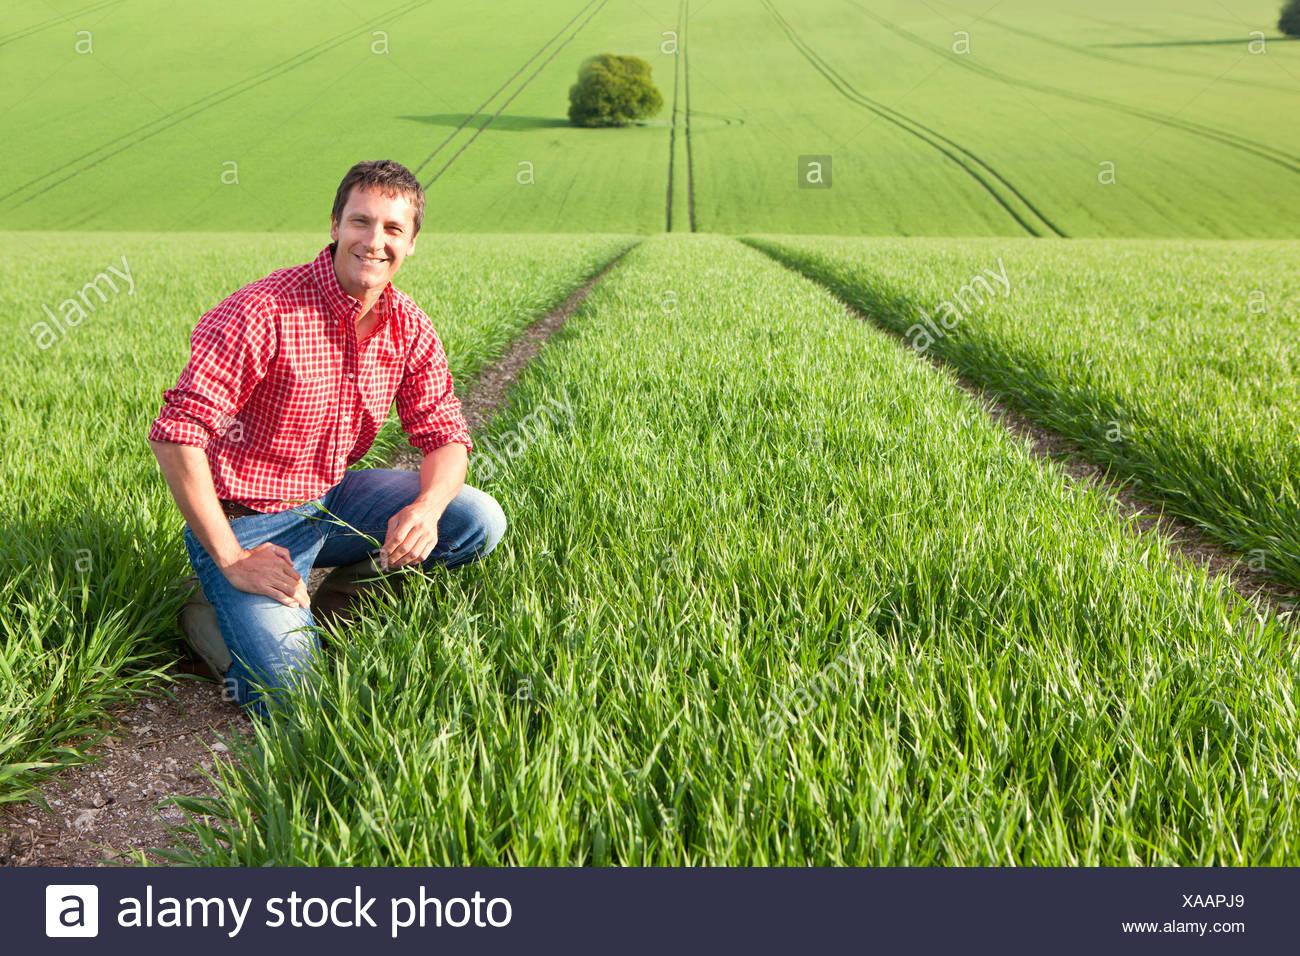 Portrait of smiling farmer in field - Stock Image